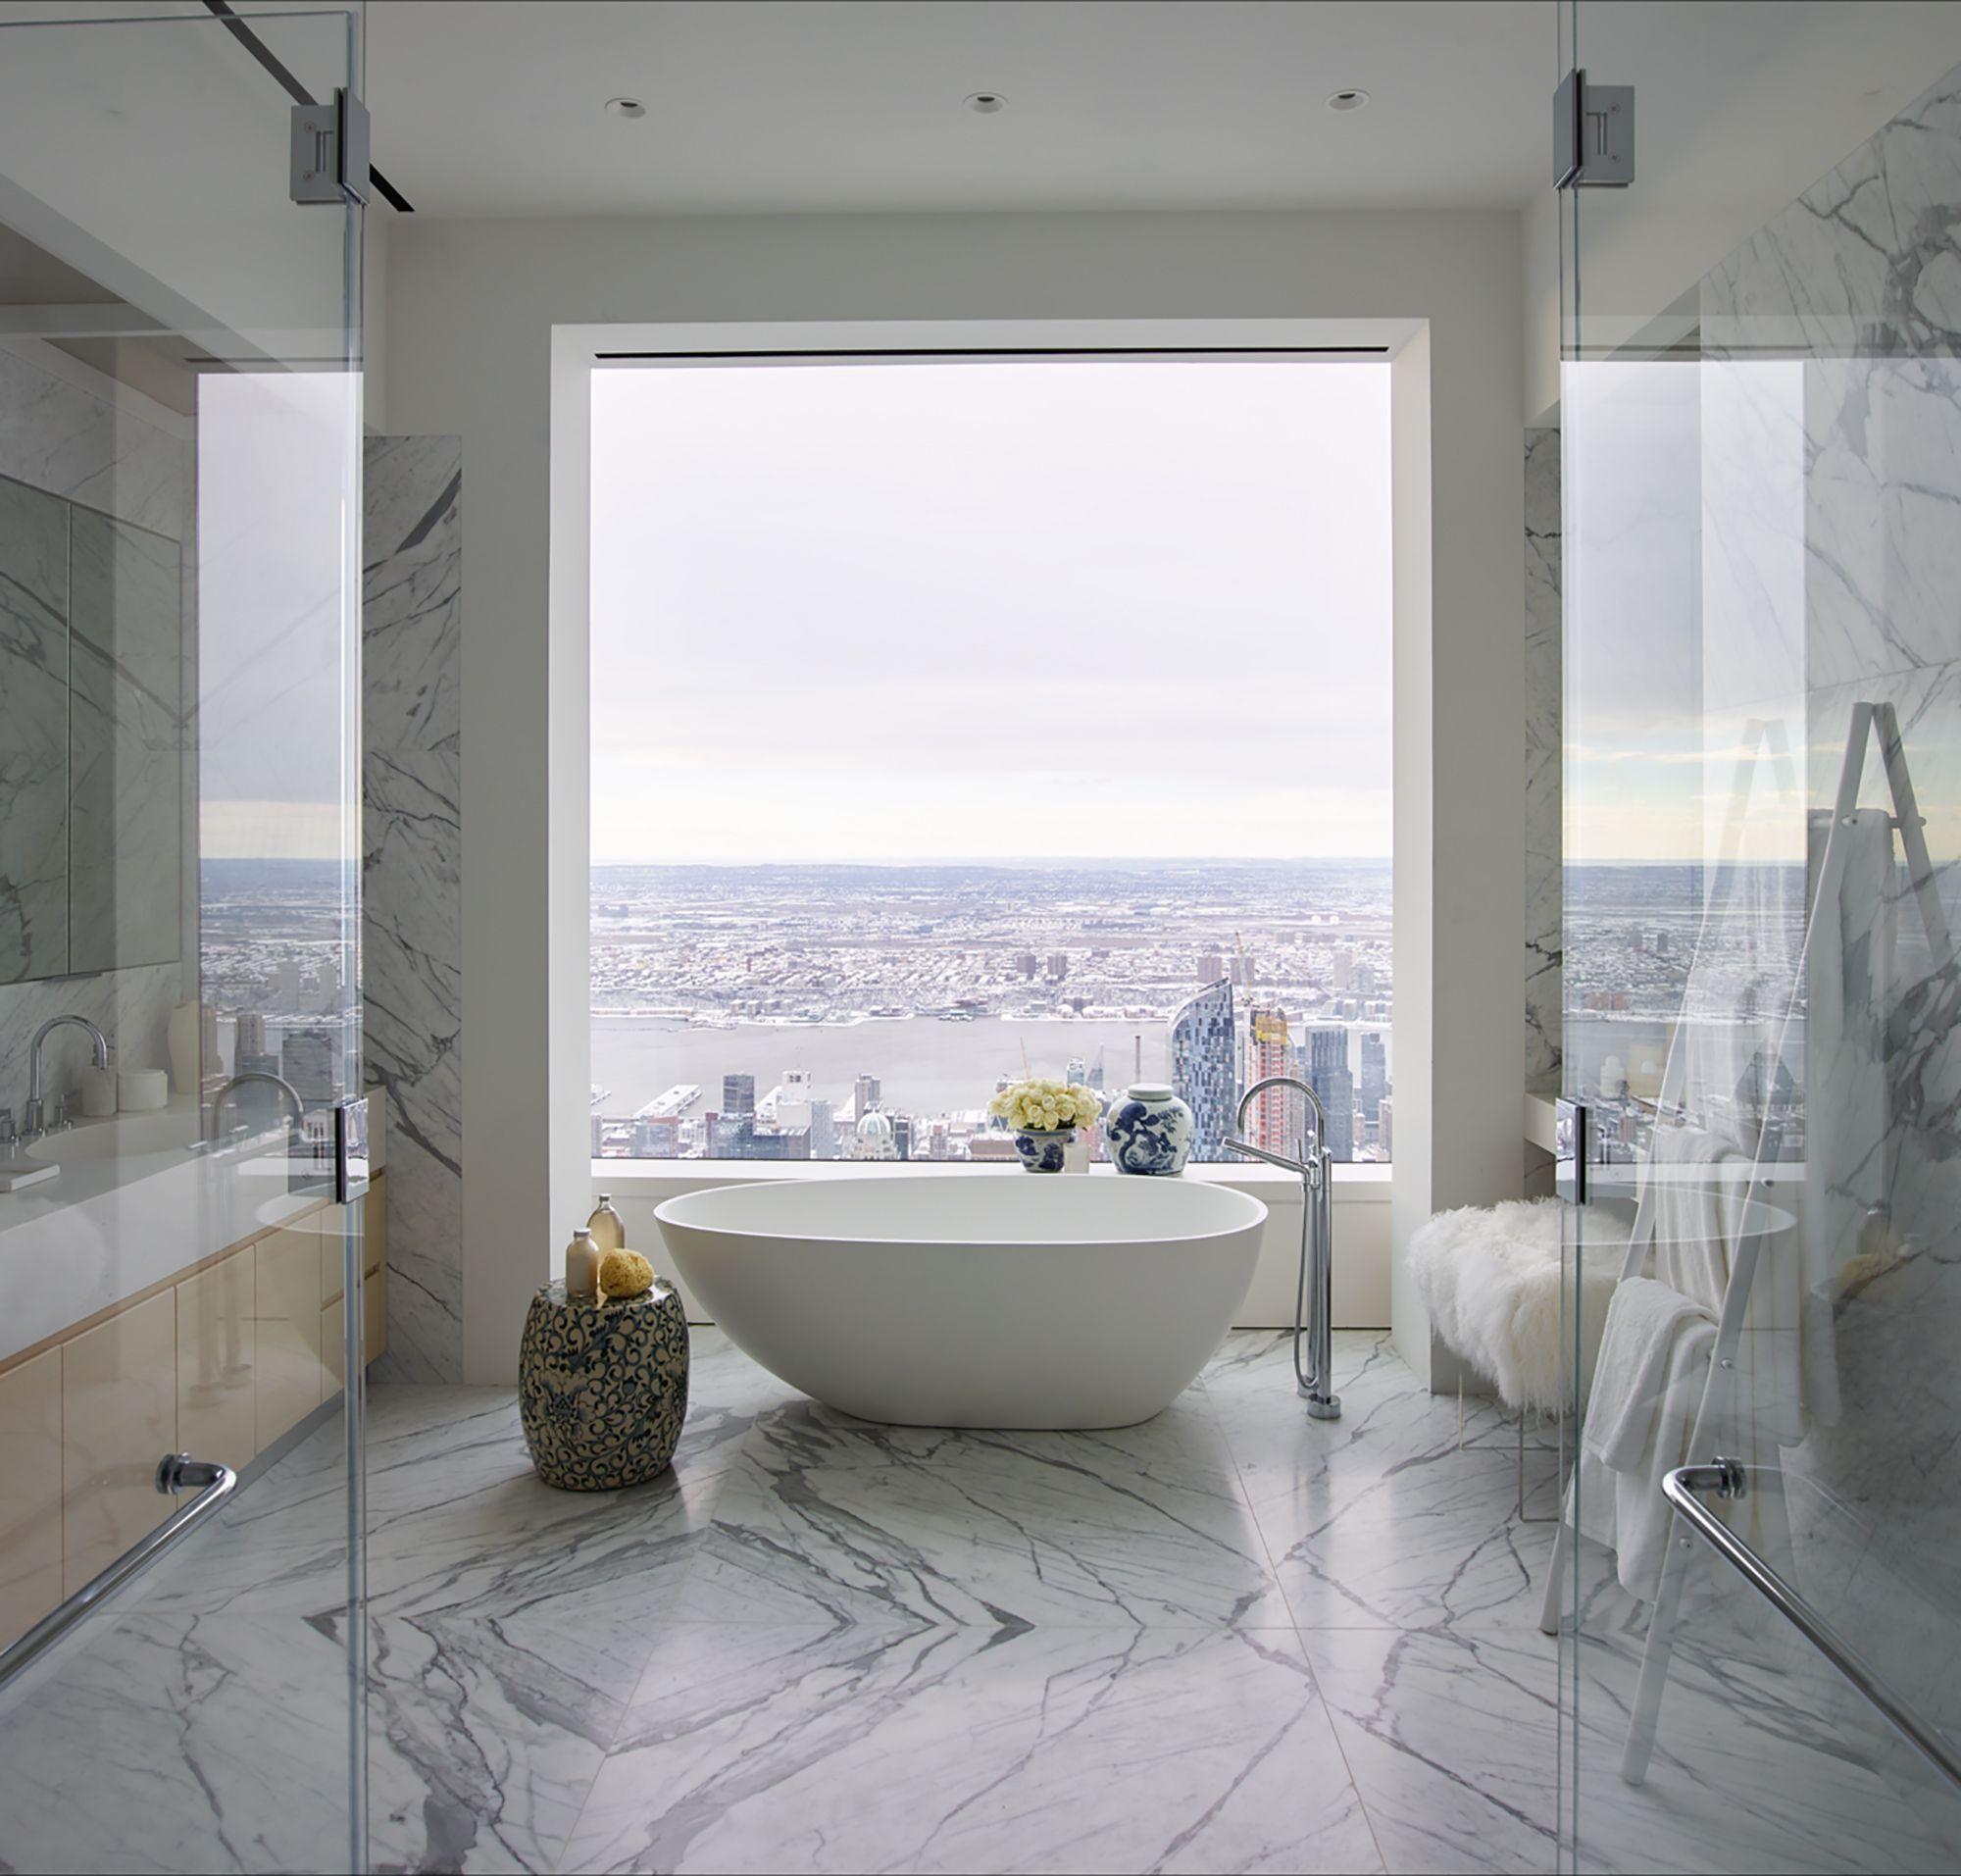 Interiors — kellybehun | STUDIO | Residential Bathrooms | Pinterest ...